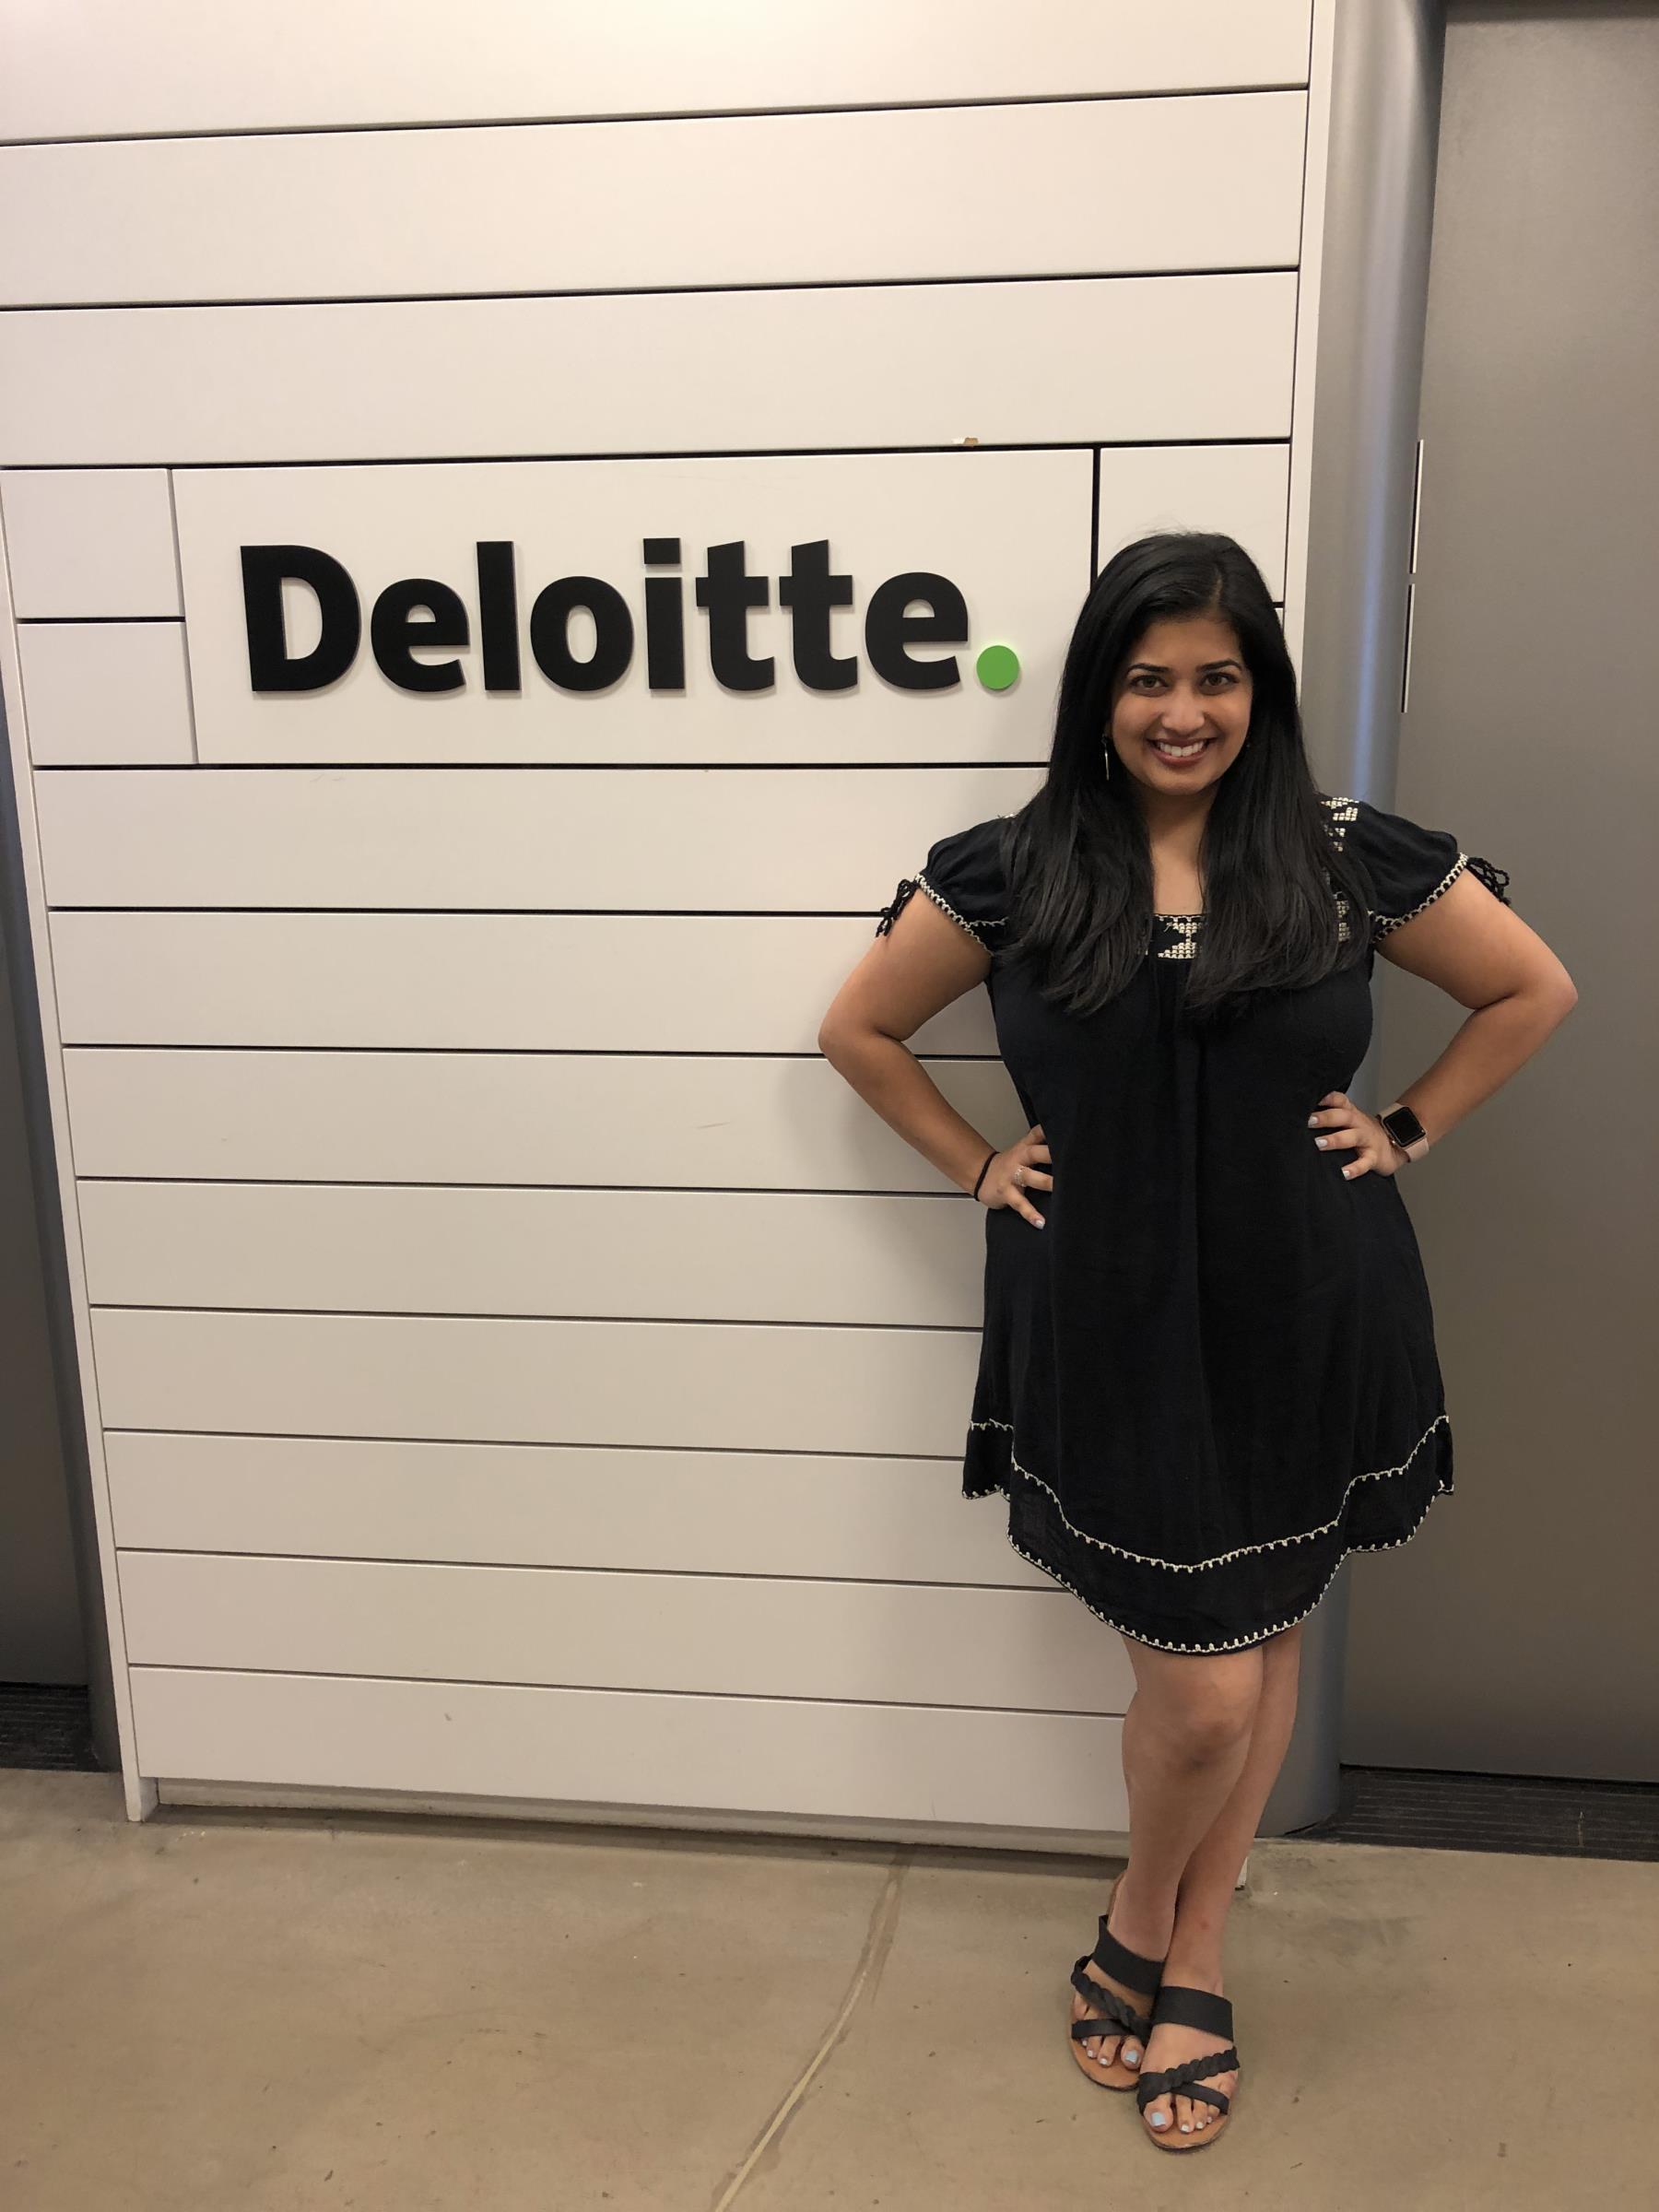 Lisa in front of Deloitte's sign